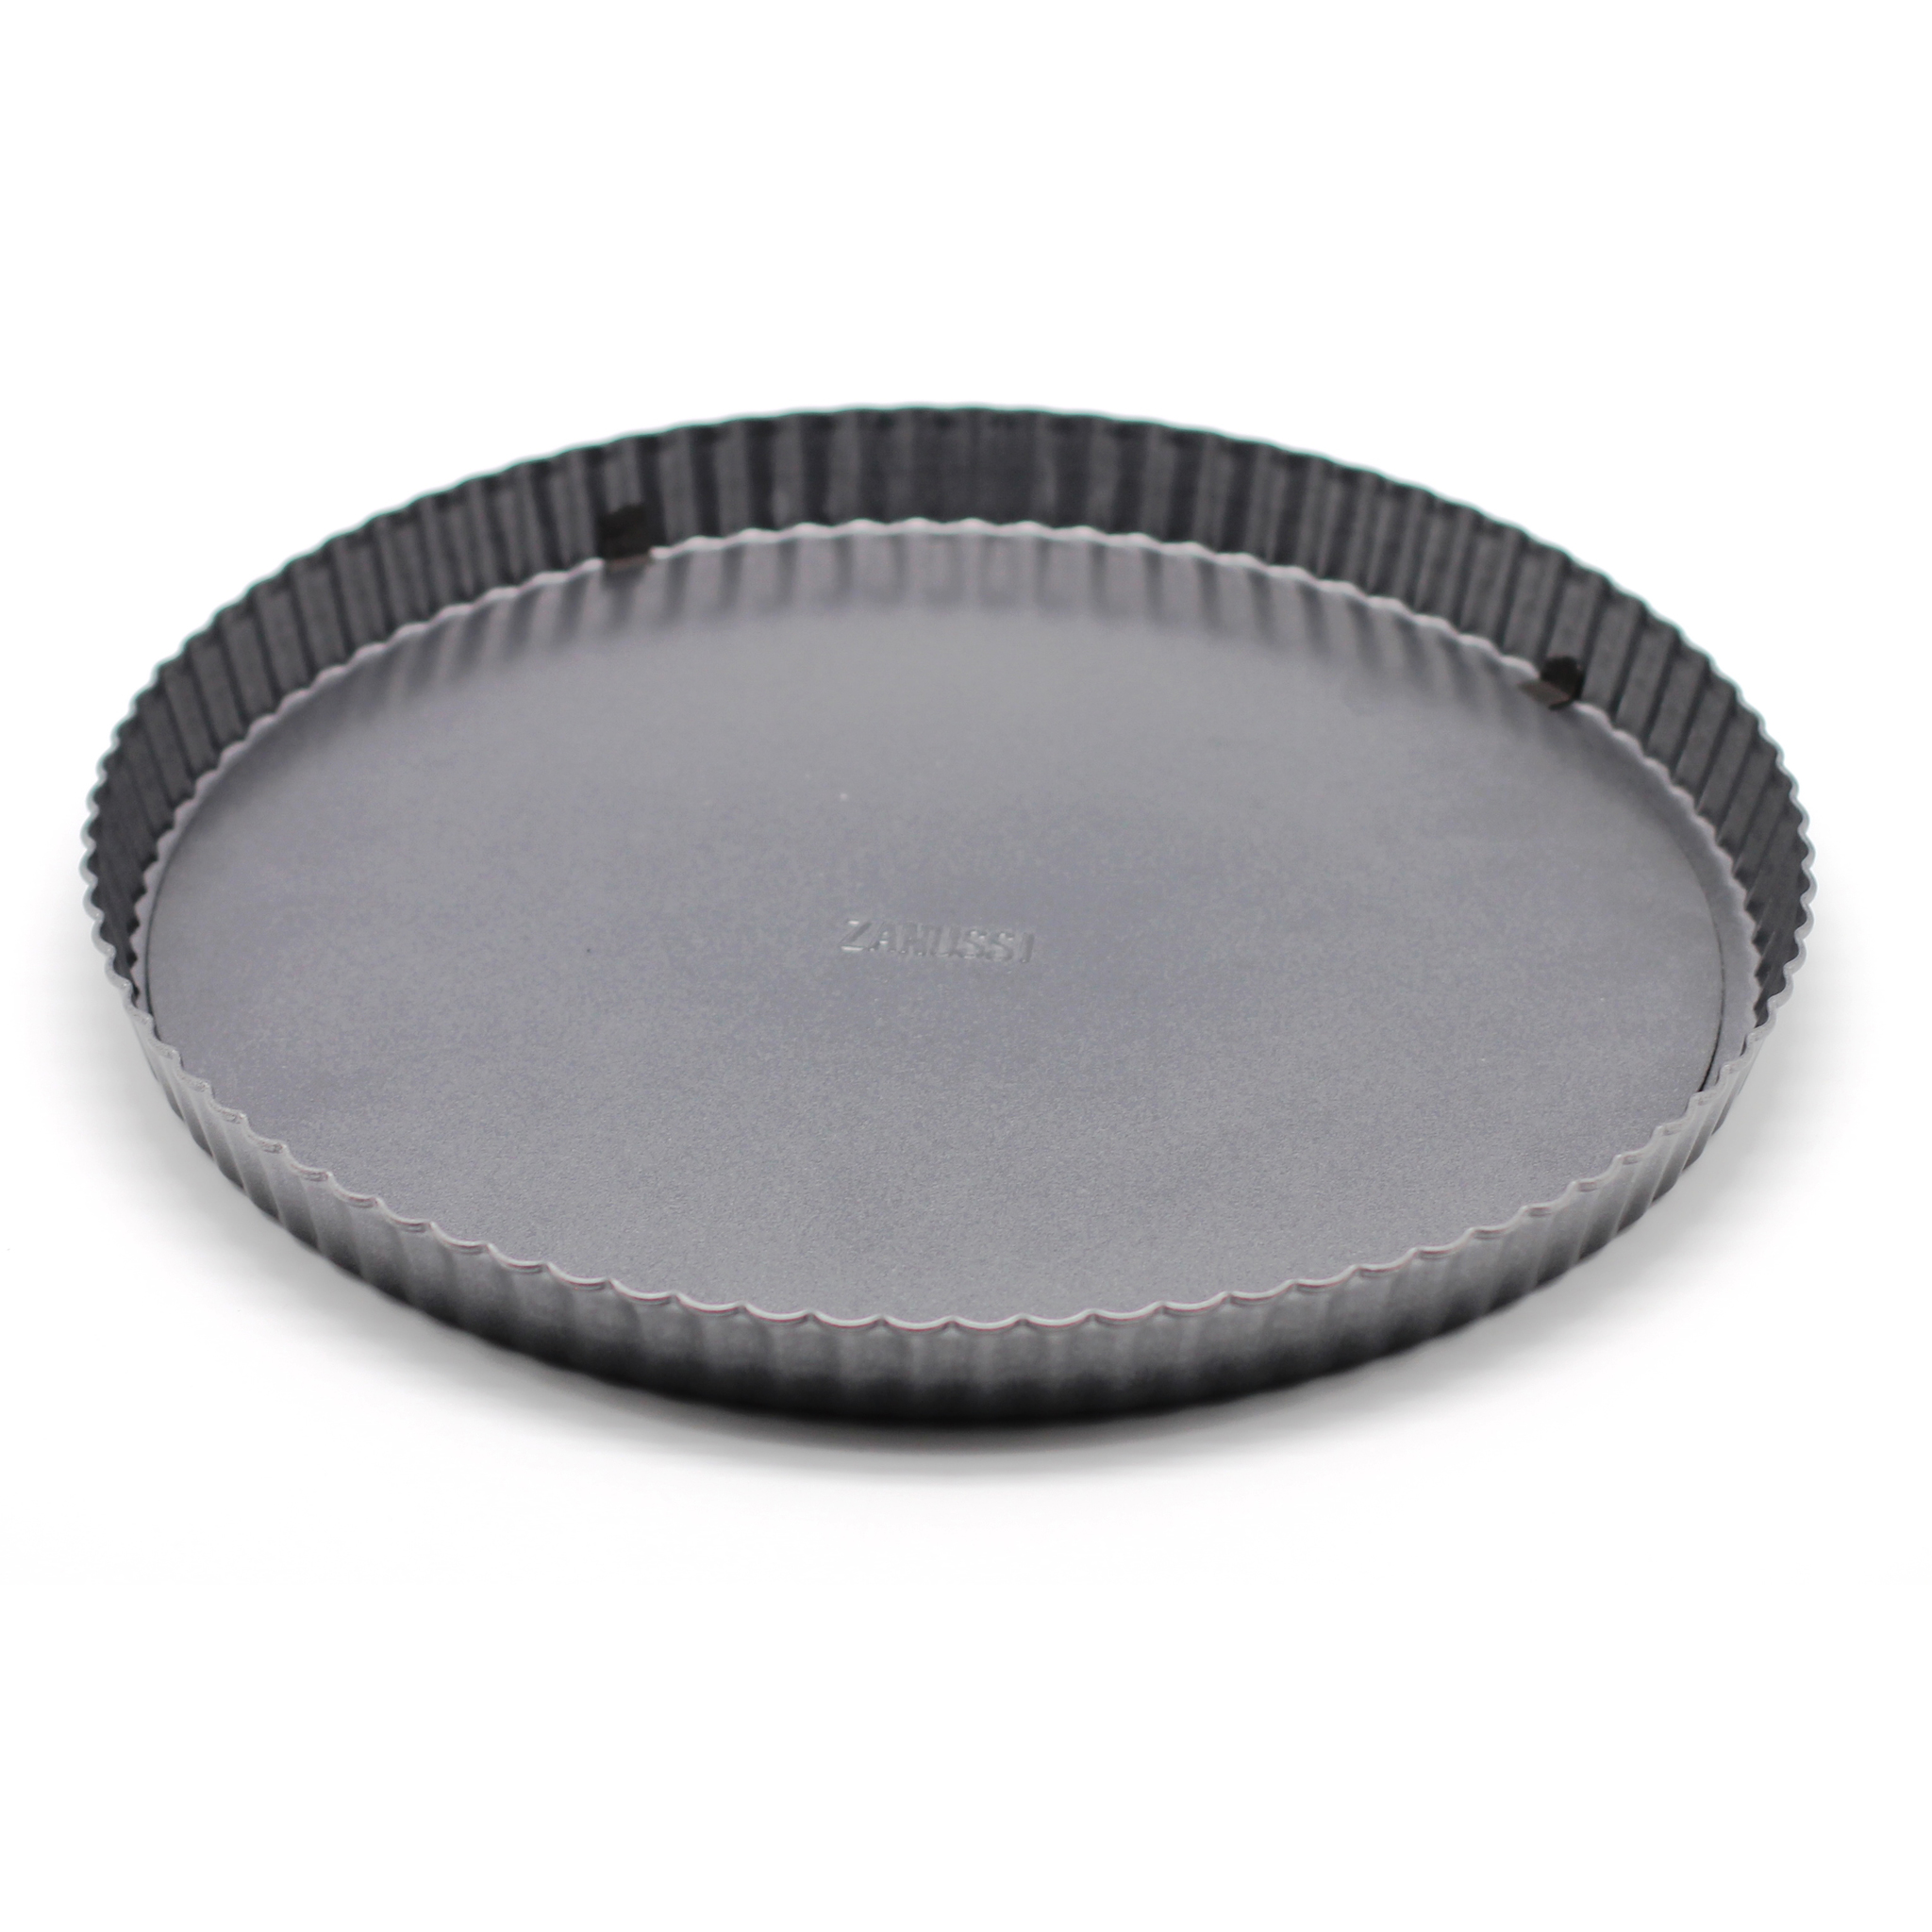 Форма для выпечки Zanussi круглая 32 см